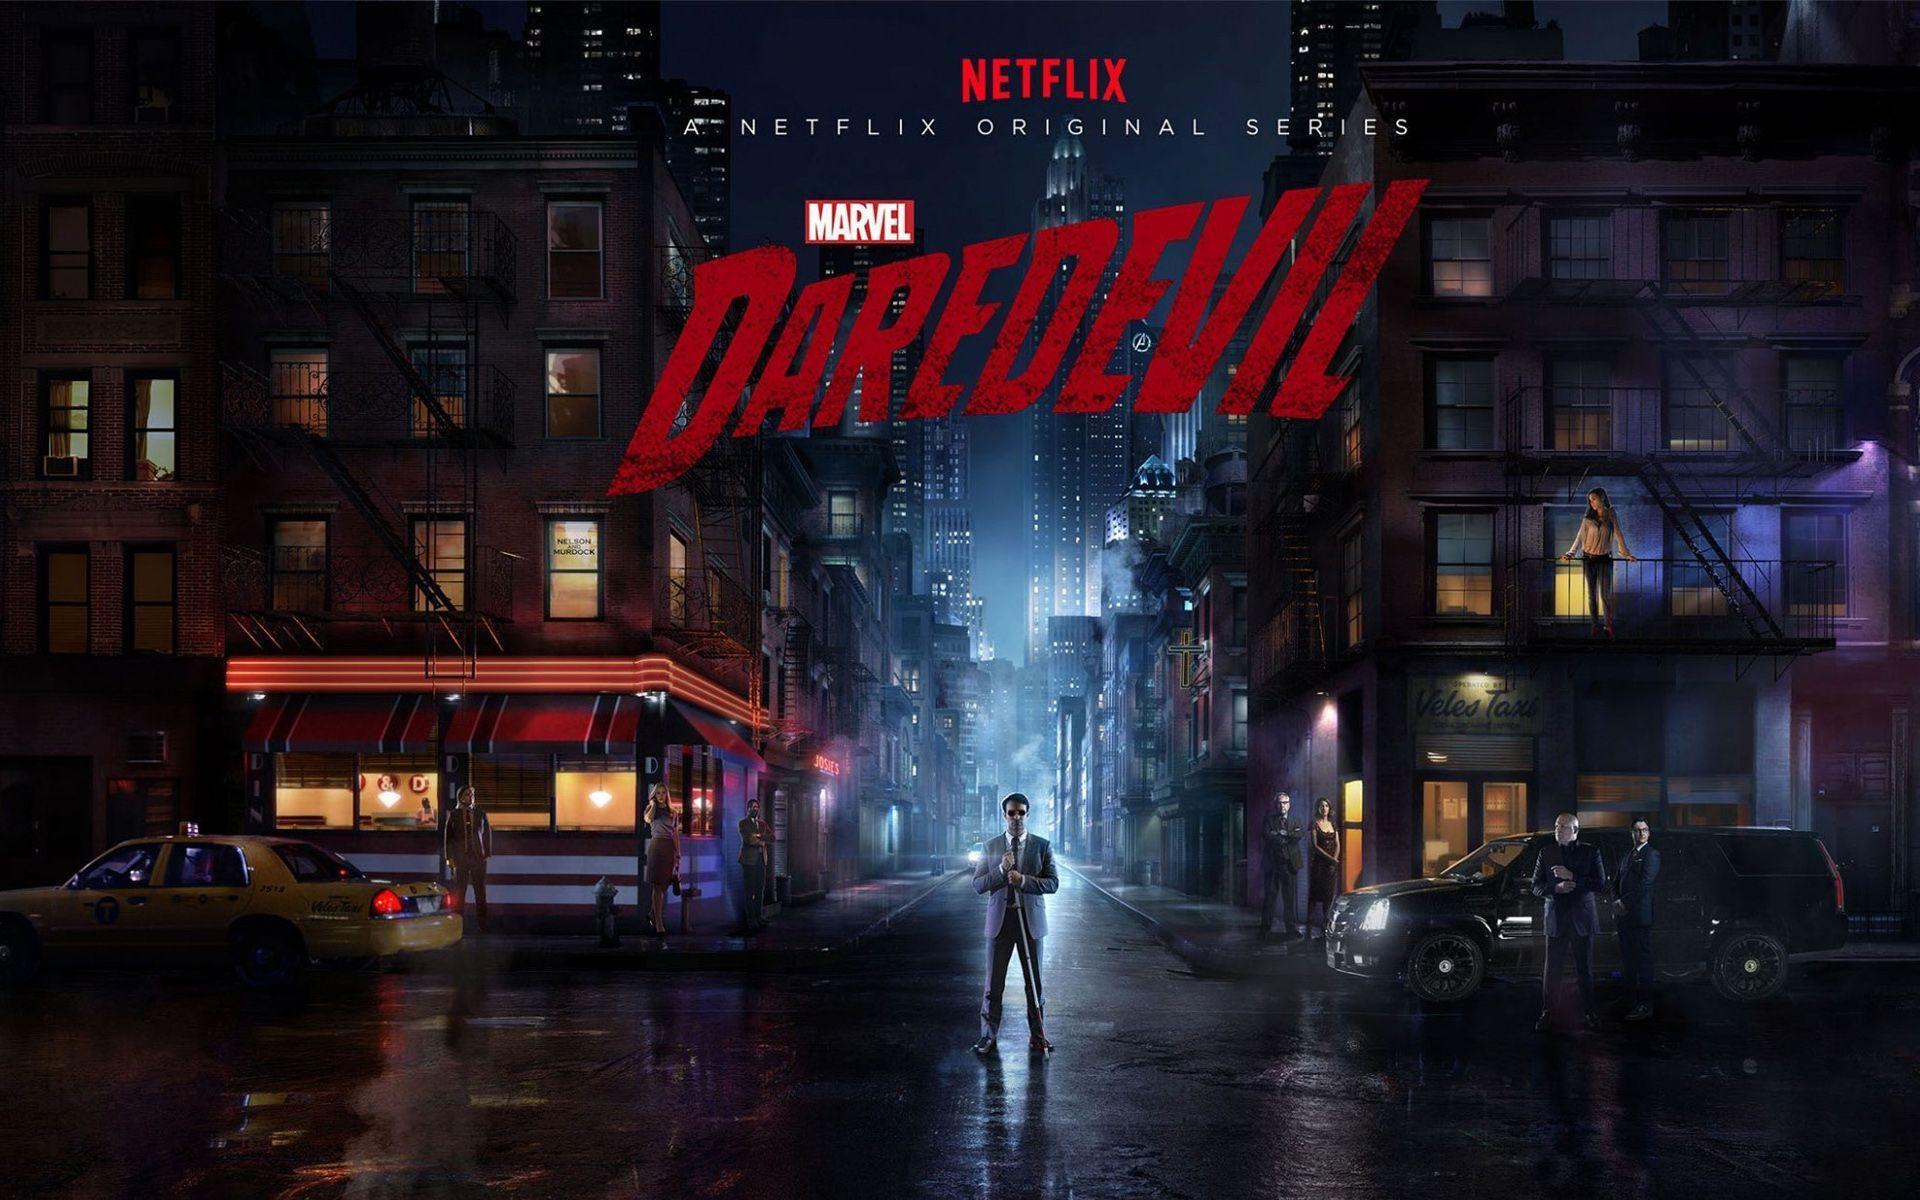 Netflix Movies Wallpapers   Top Netflix Movies Backgrounds 1920x1200